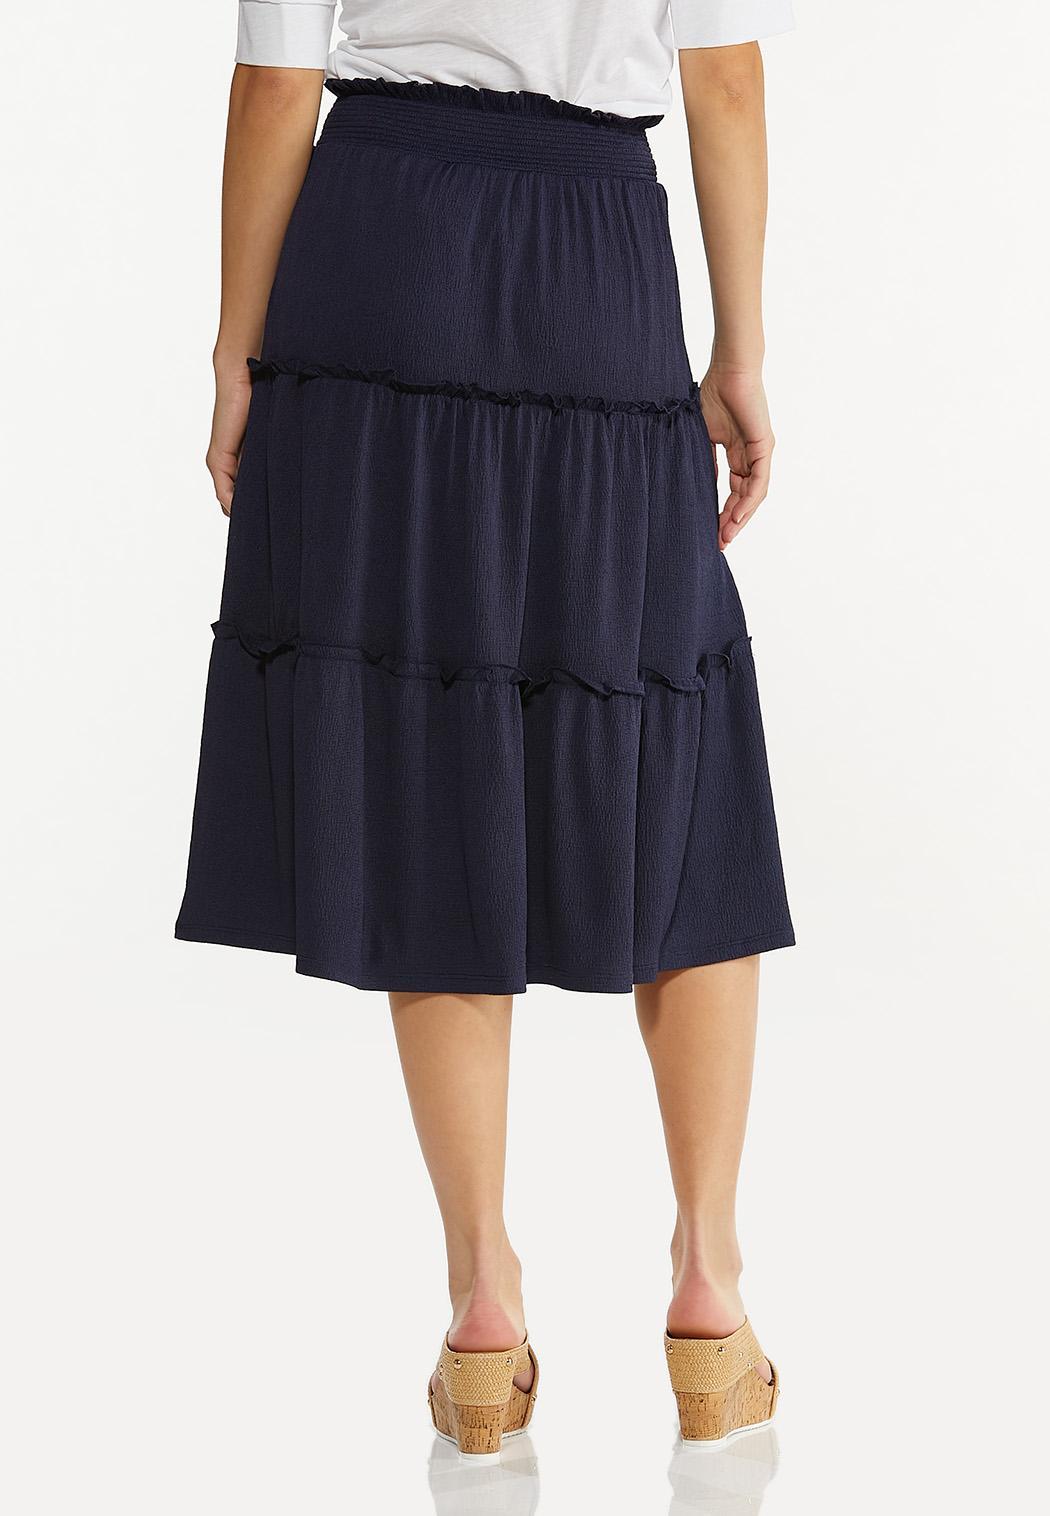 Plus Size Textured Midi Skirt (Item #44530820)